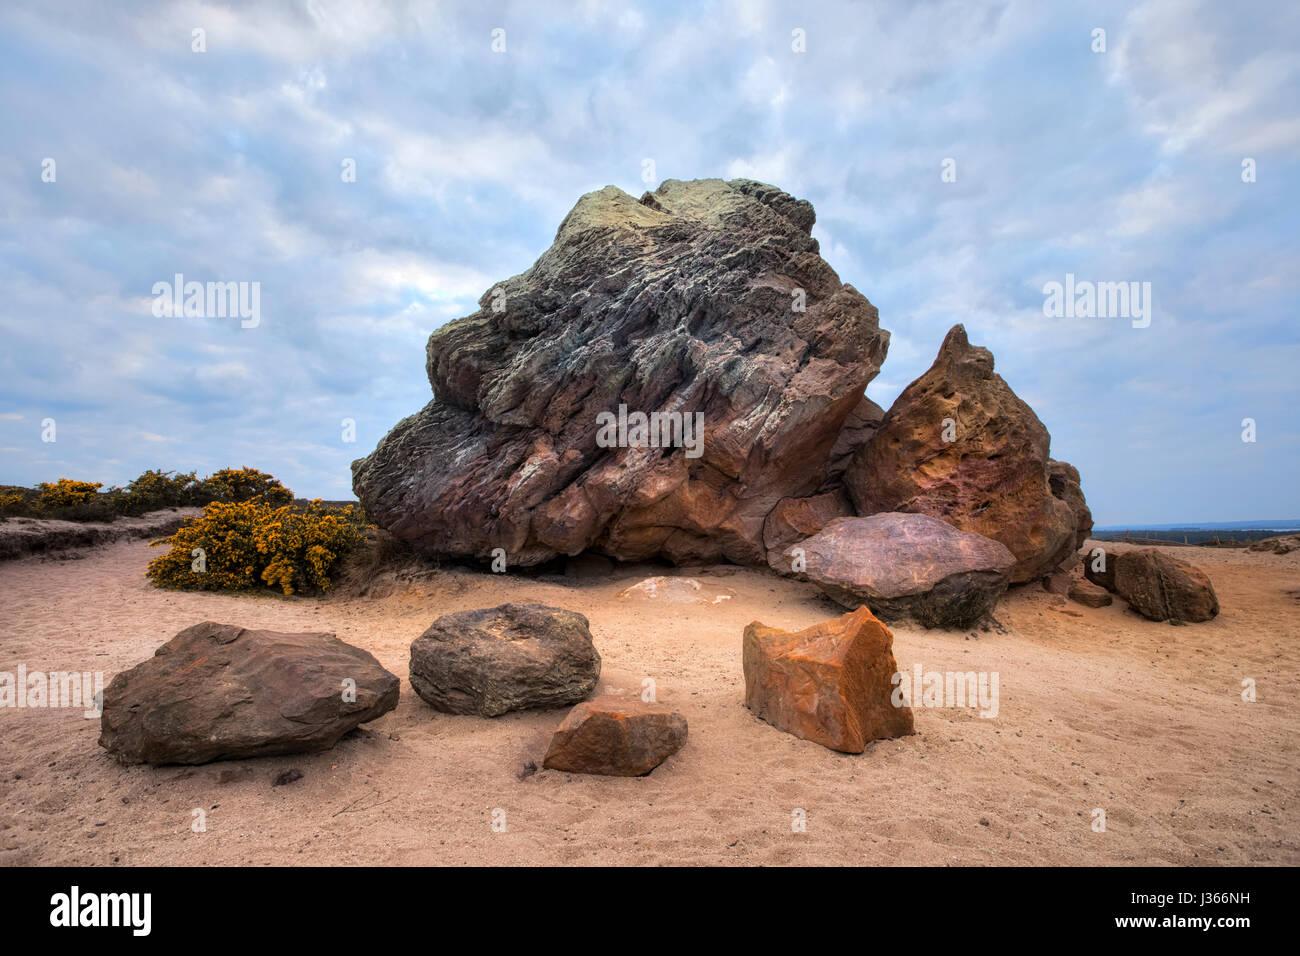 Agglestone Rock, Purbeck, Studland, Dorset, England - Stock-Bilder